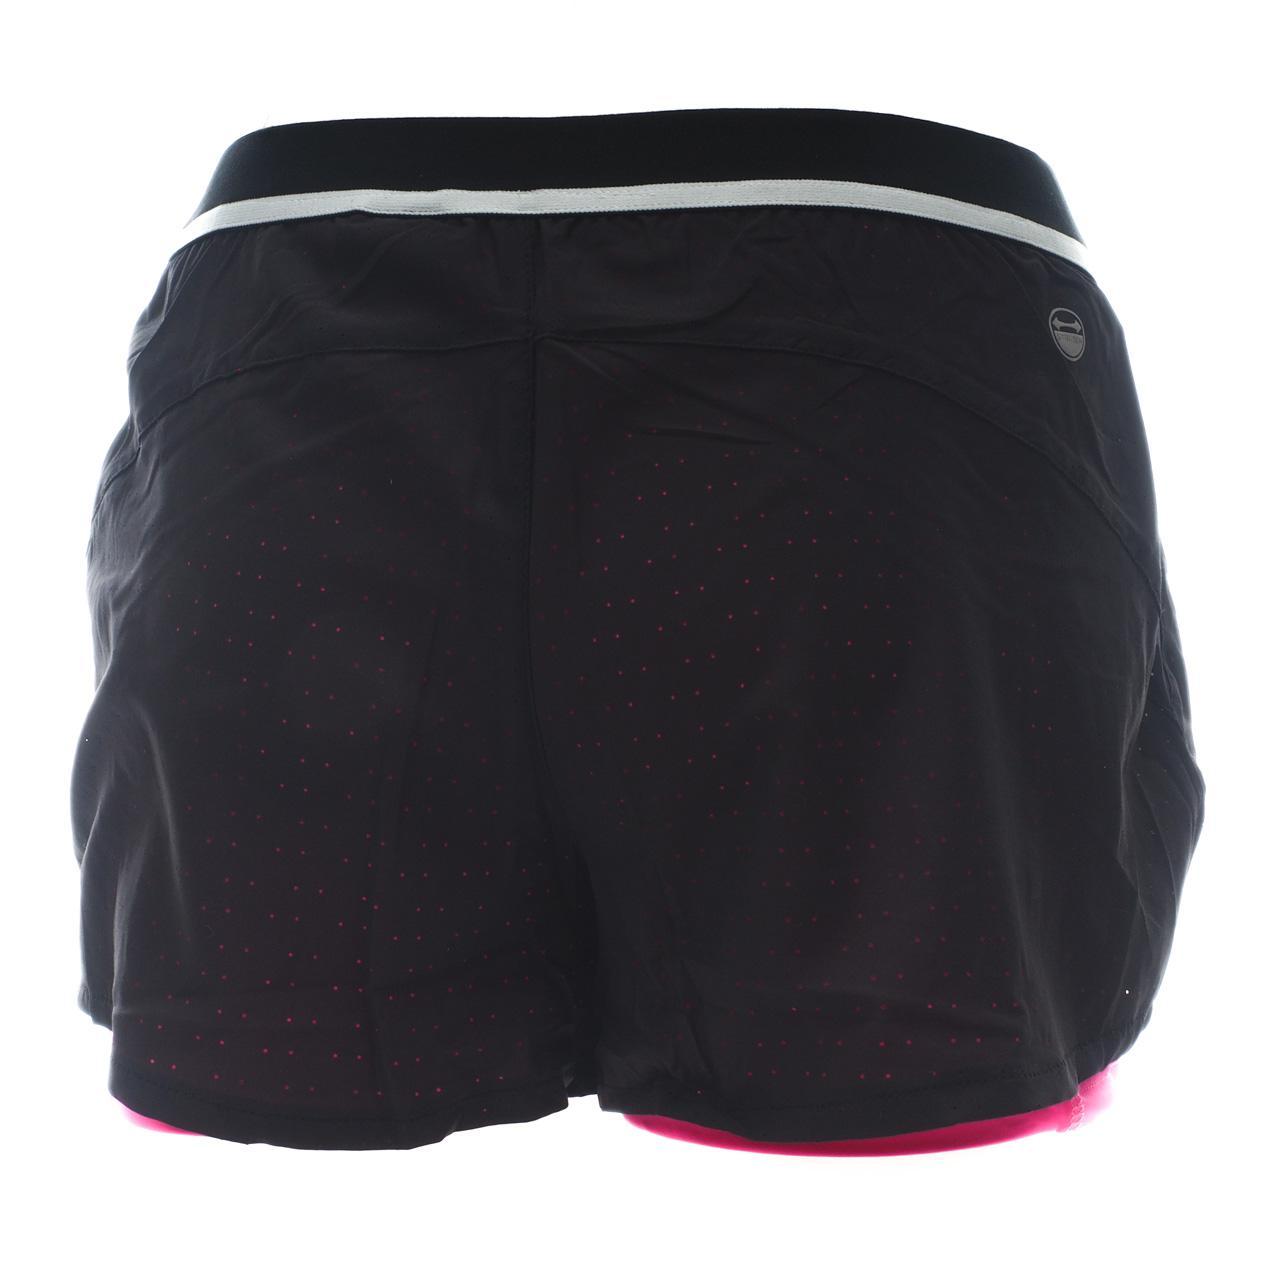 short-Laufen-Li-ning-Lolly-Nr-Rse-Shorts-Run-L-Schwarz-17898-Neu Indexbild 4